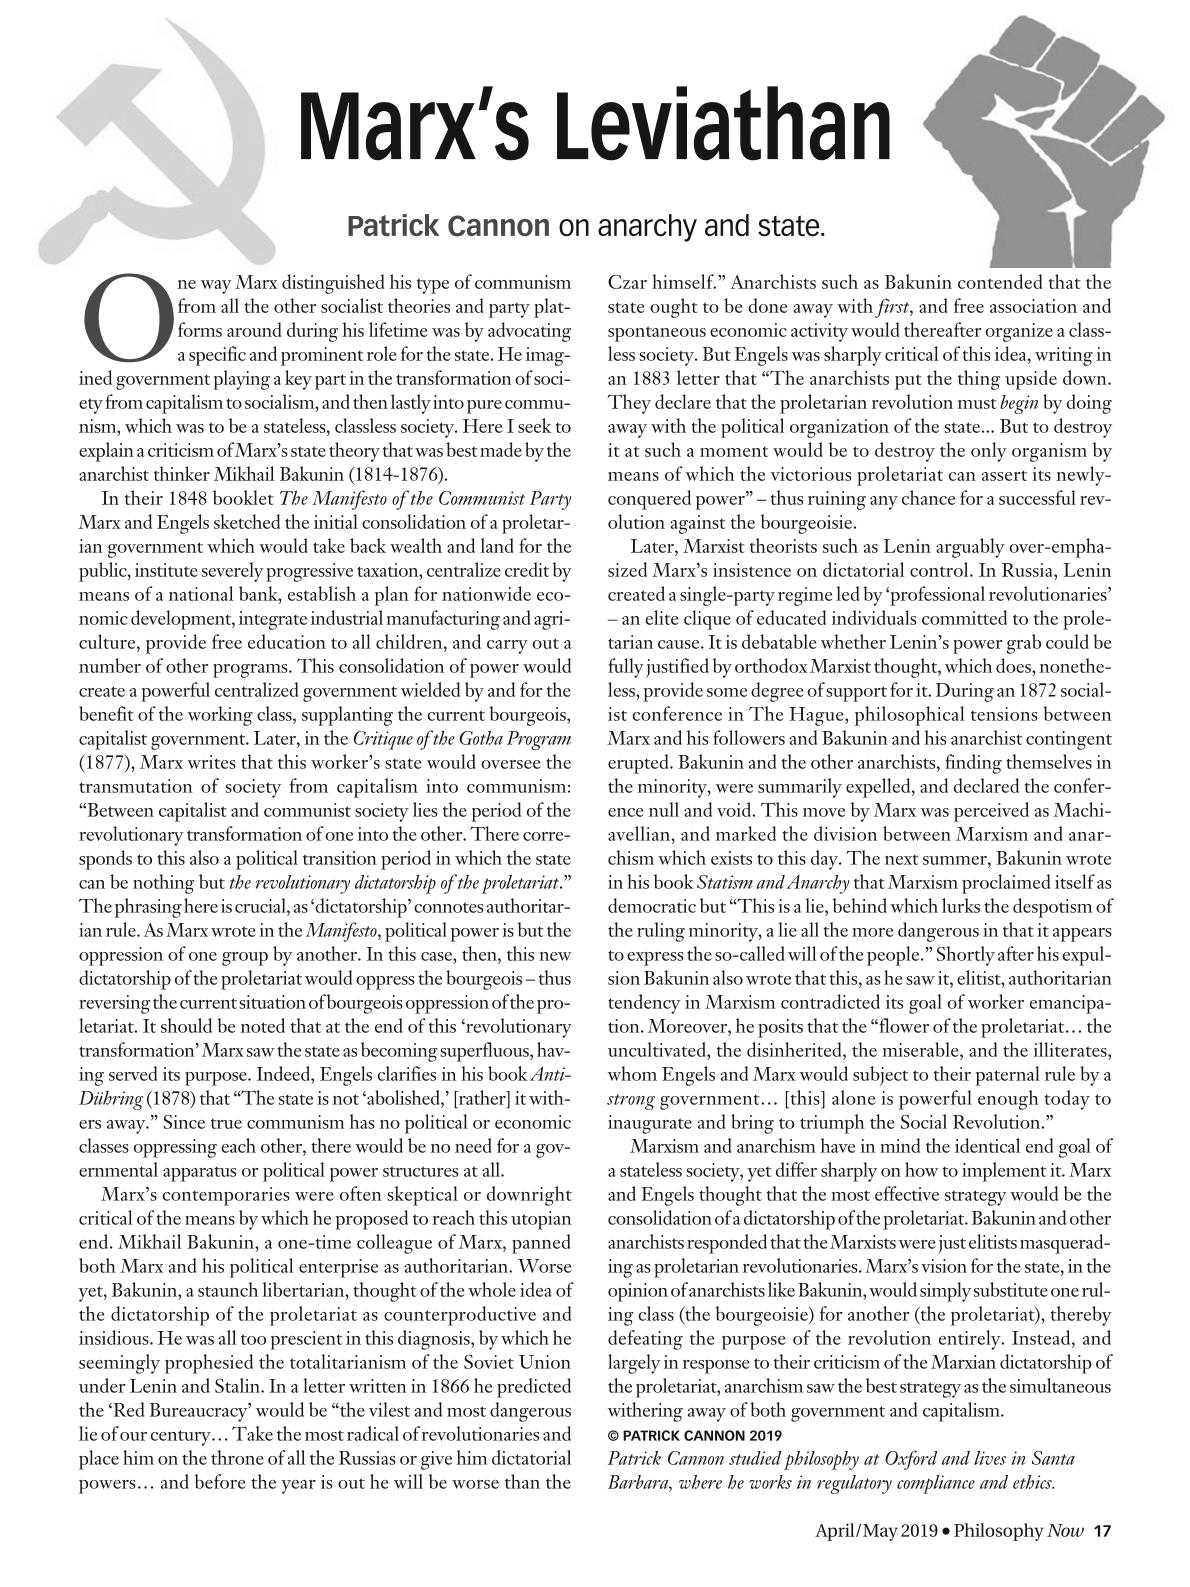 Marx's Leviathan - Patrick Cannon - Philosophy Now